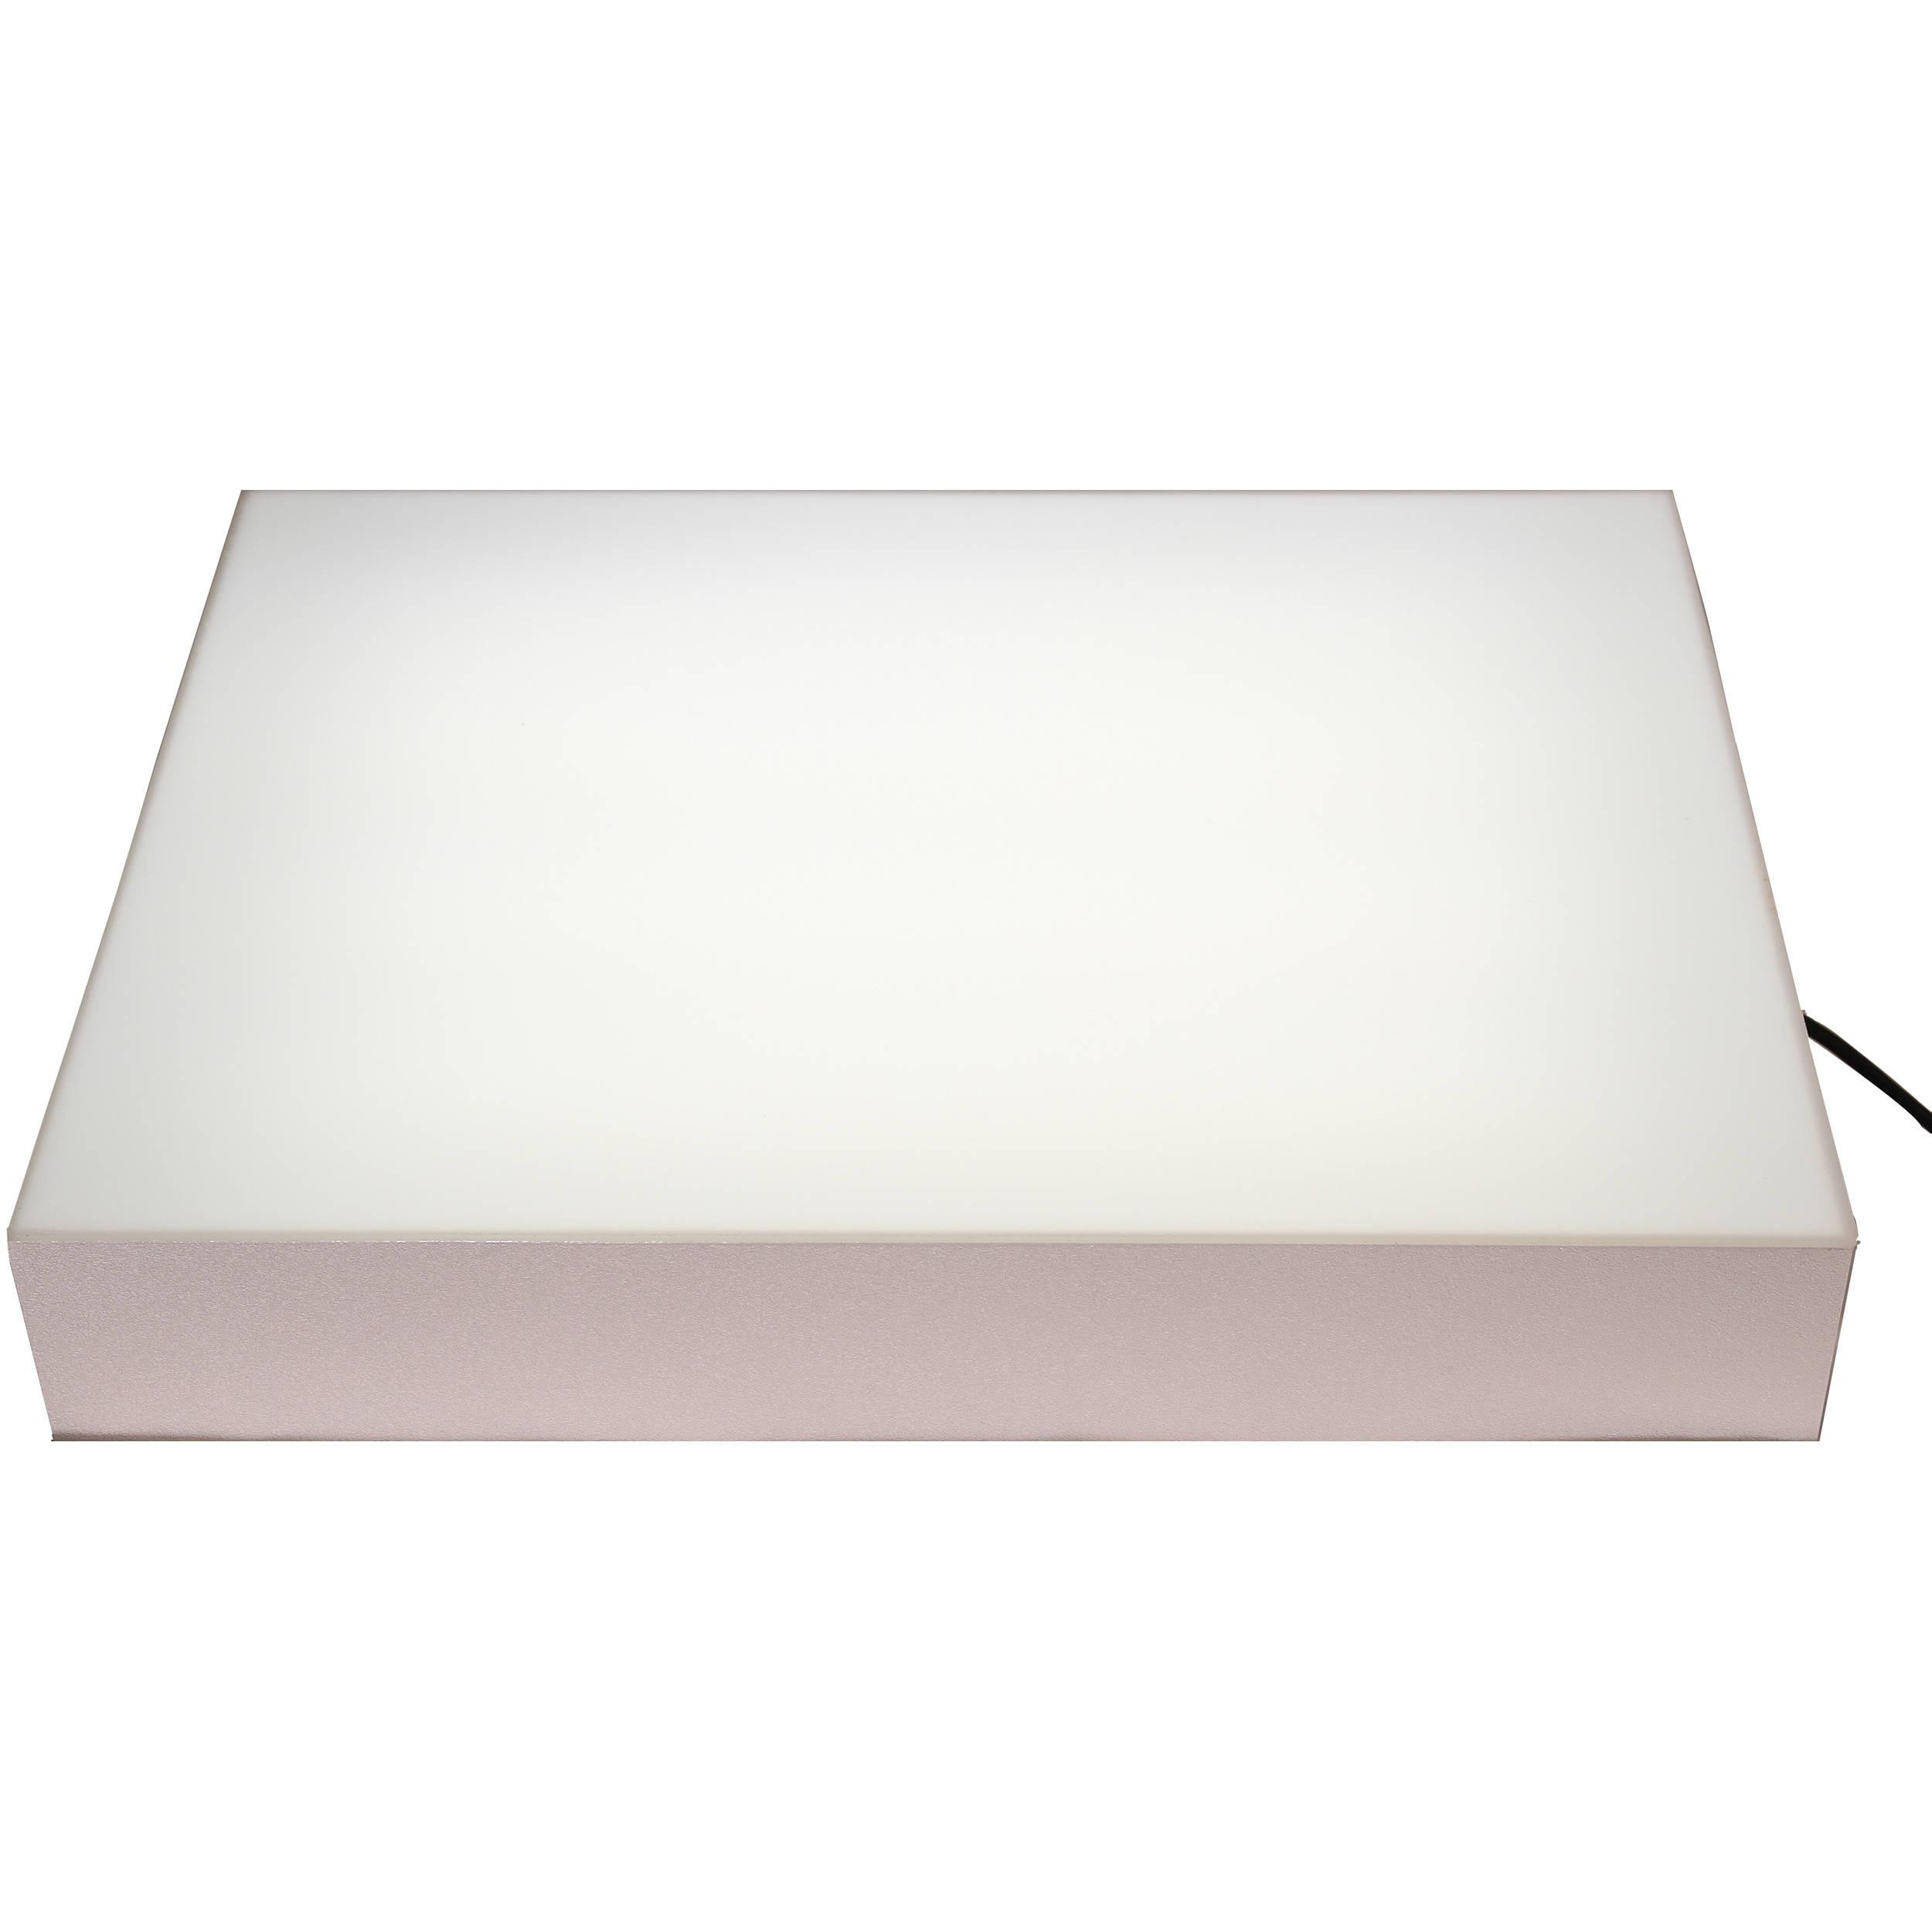 porta trace gagne 18x24 led abs 18 x 24 led white f. Black Bedroom Furniture Sets. Home Design Ideas